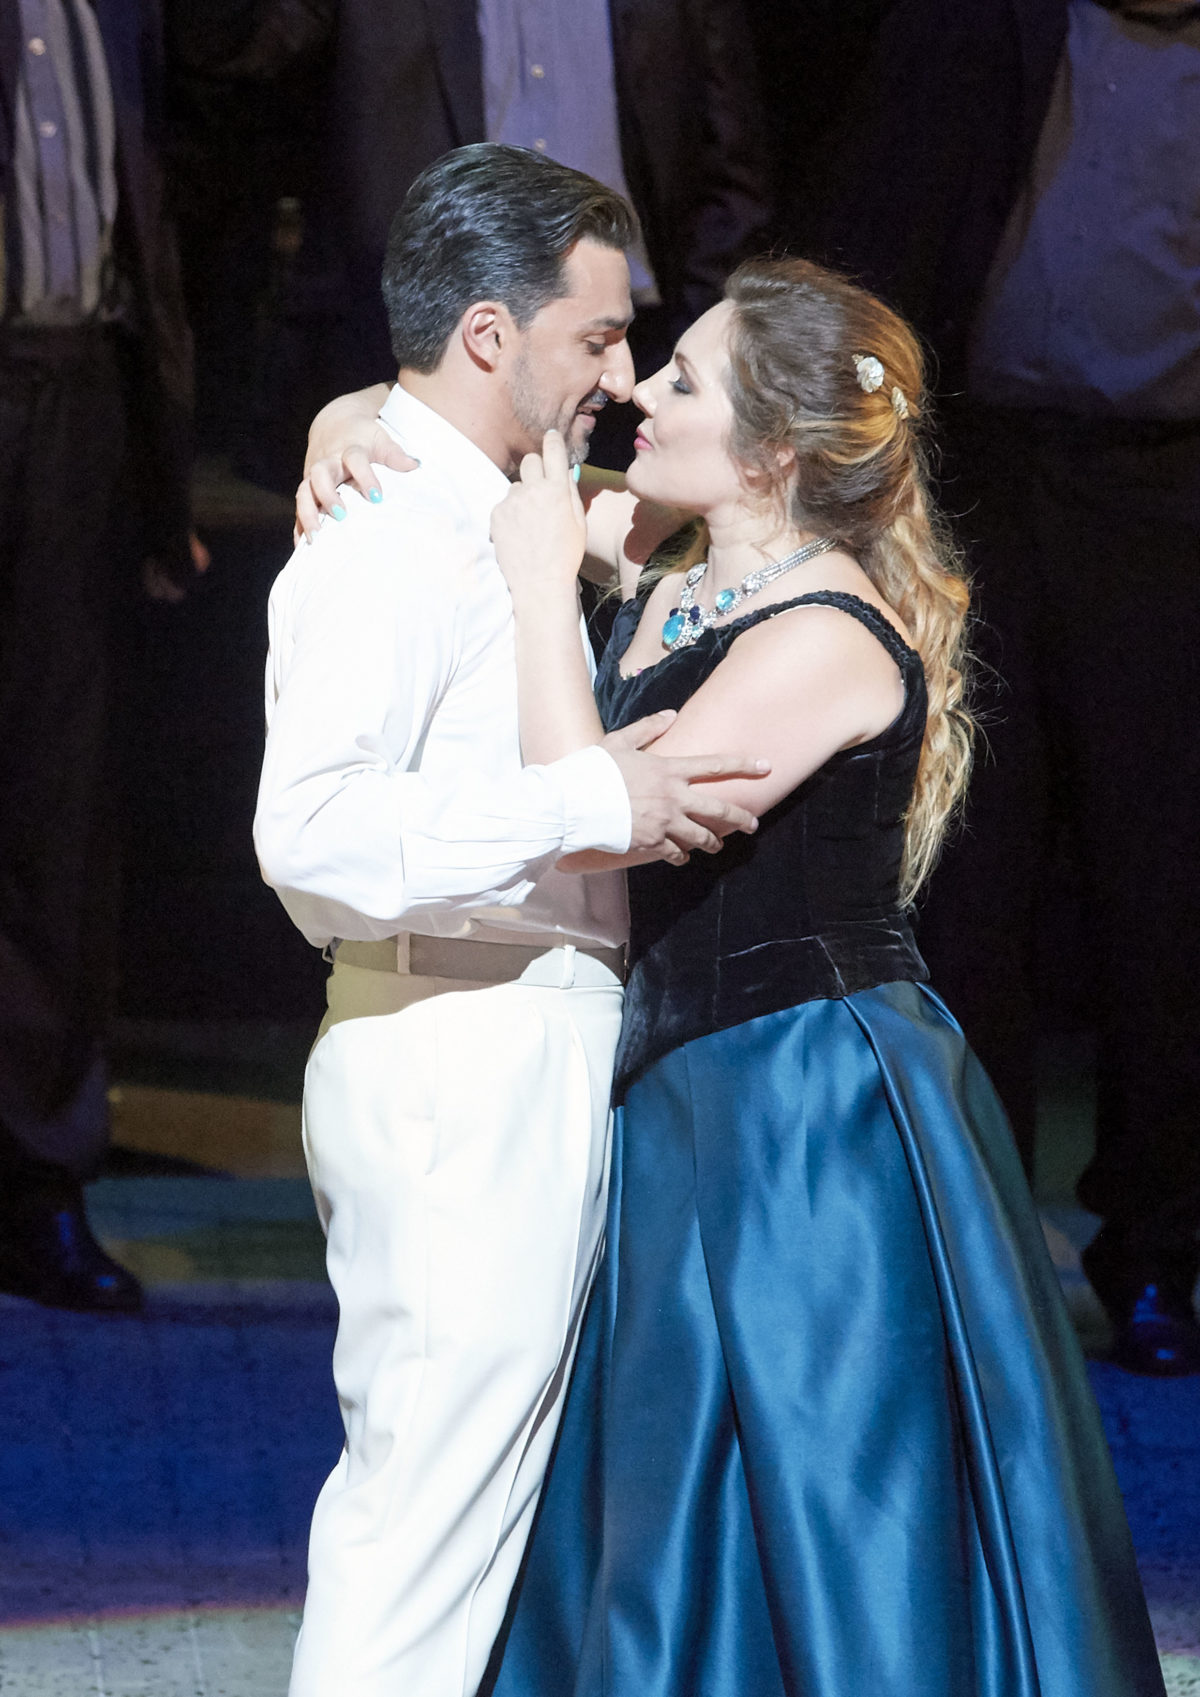 Giuseppe Verdi, LA TRAVIATA,  Wiener Staatsoper, 4. September 2019 (Saisoneröffnung)